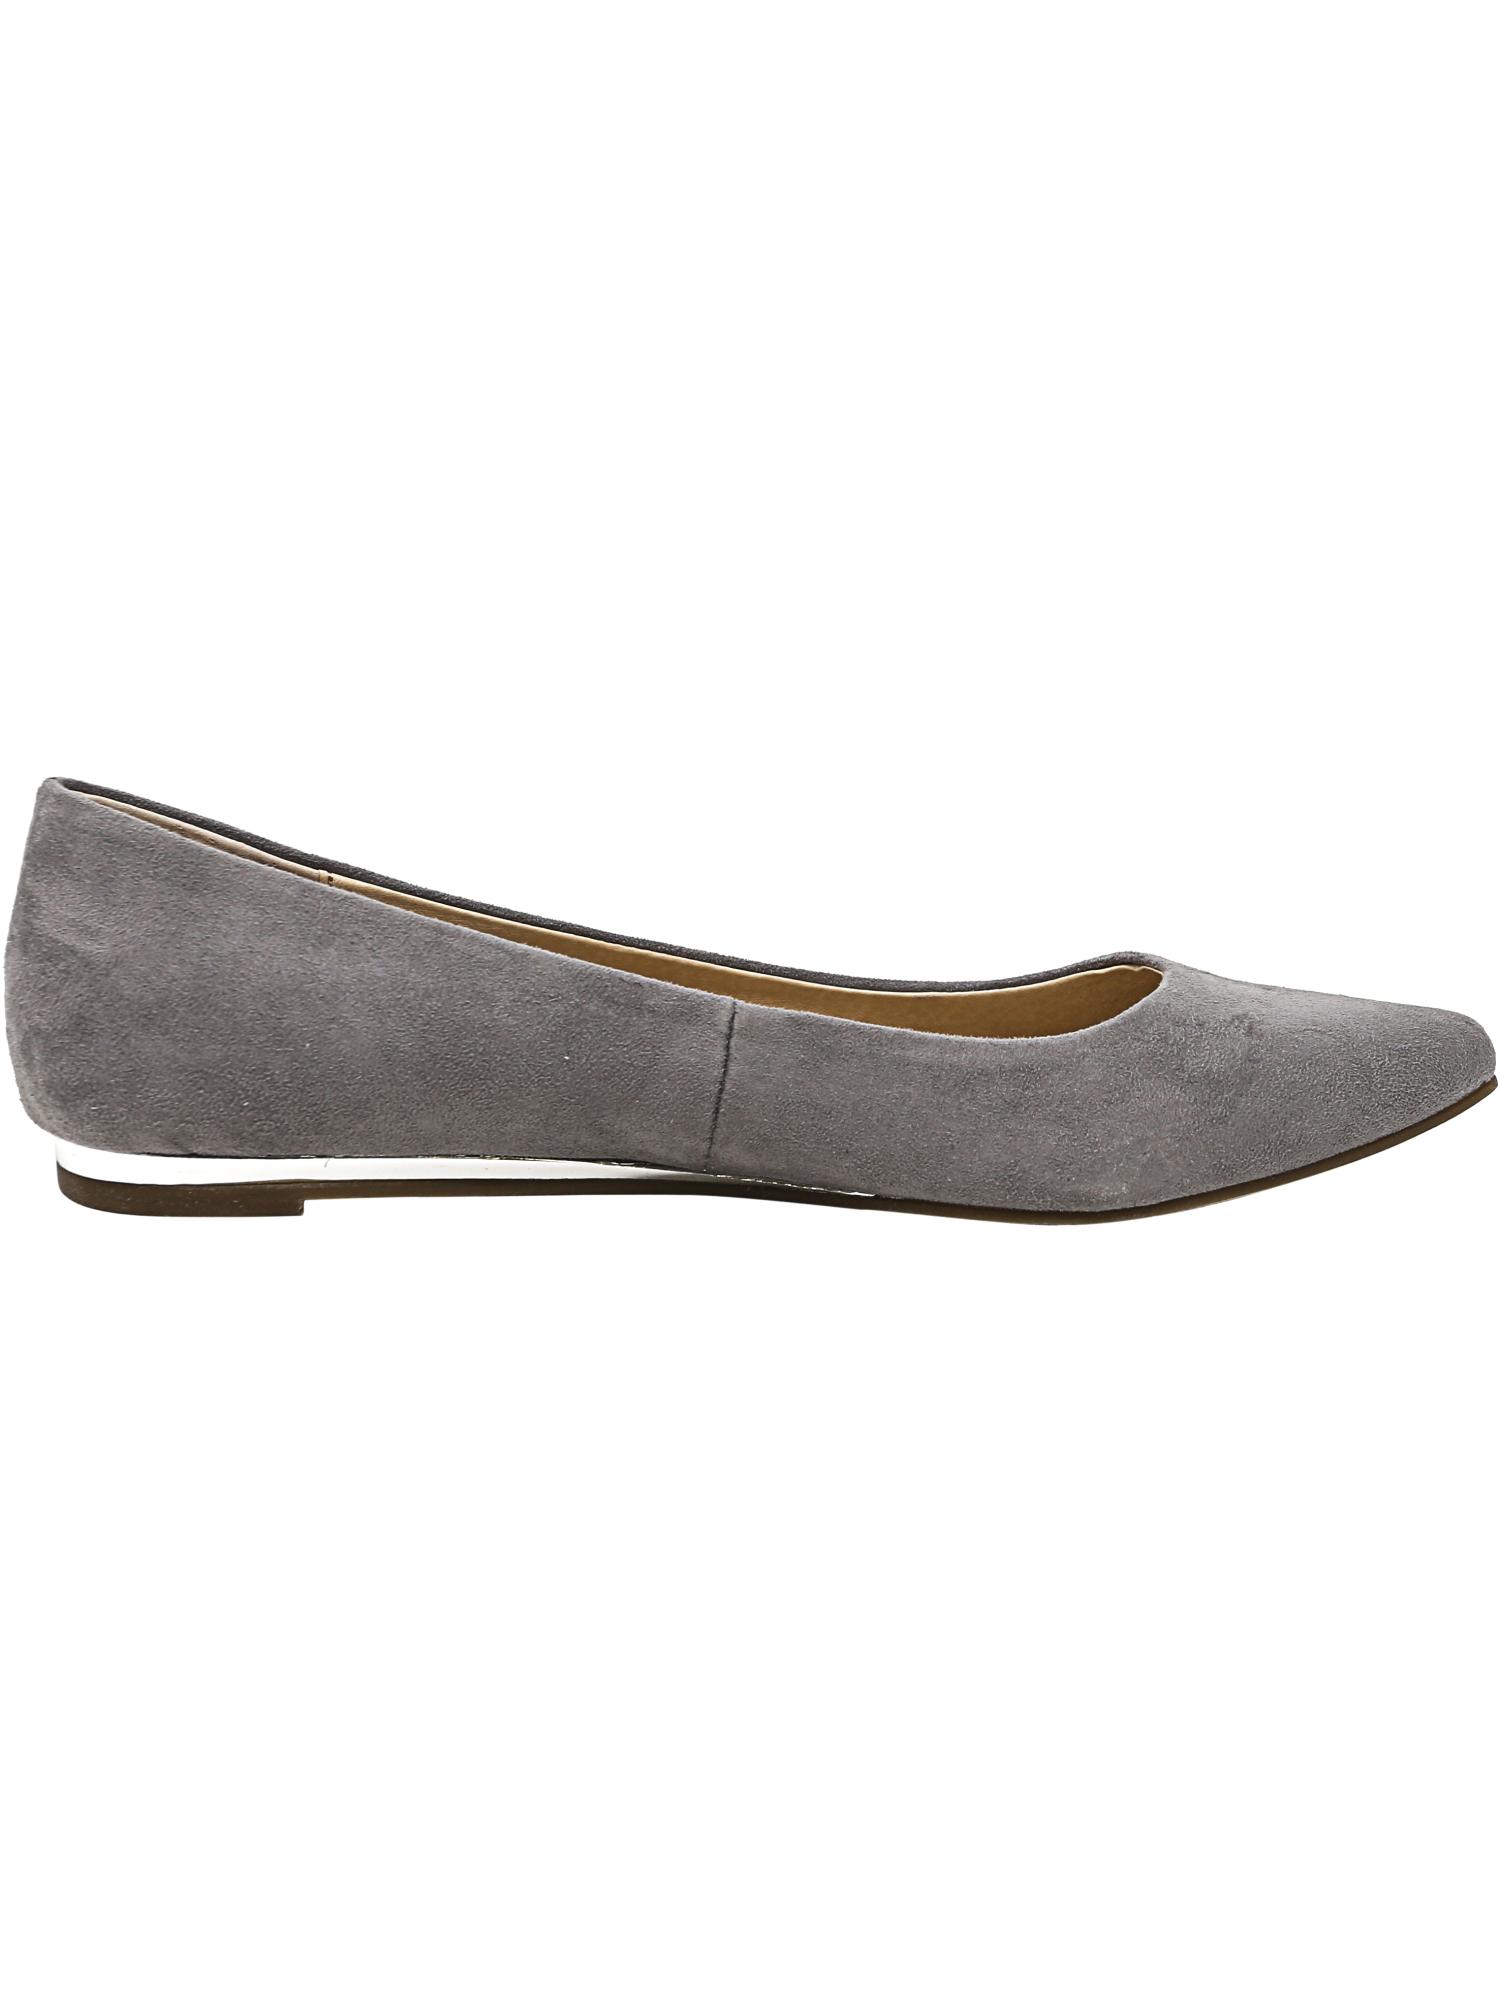 Steve-Madden-Women-039-s-Edge-Fabric-Ankle-High-Flat-Shoe thumbnail 10